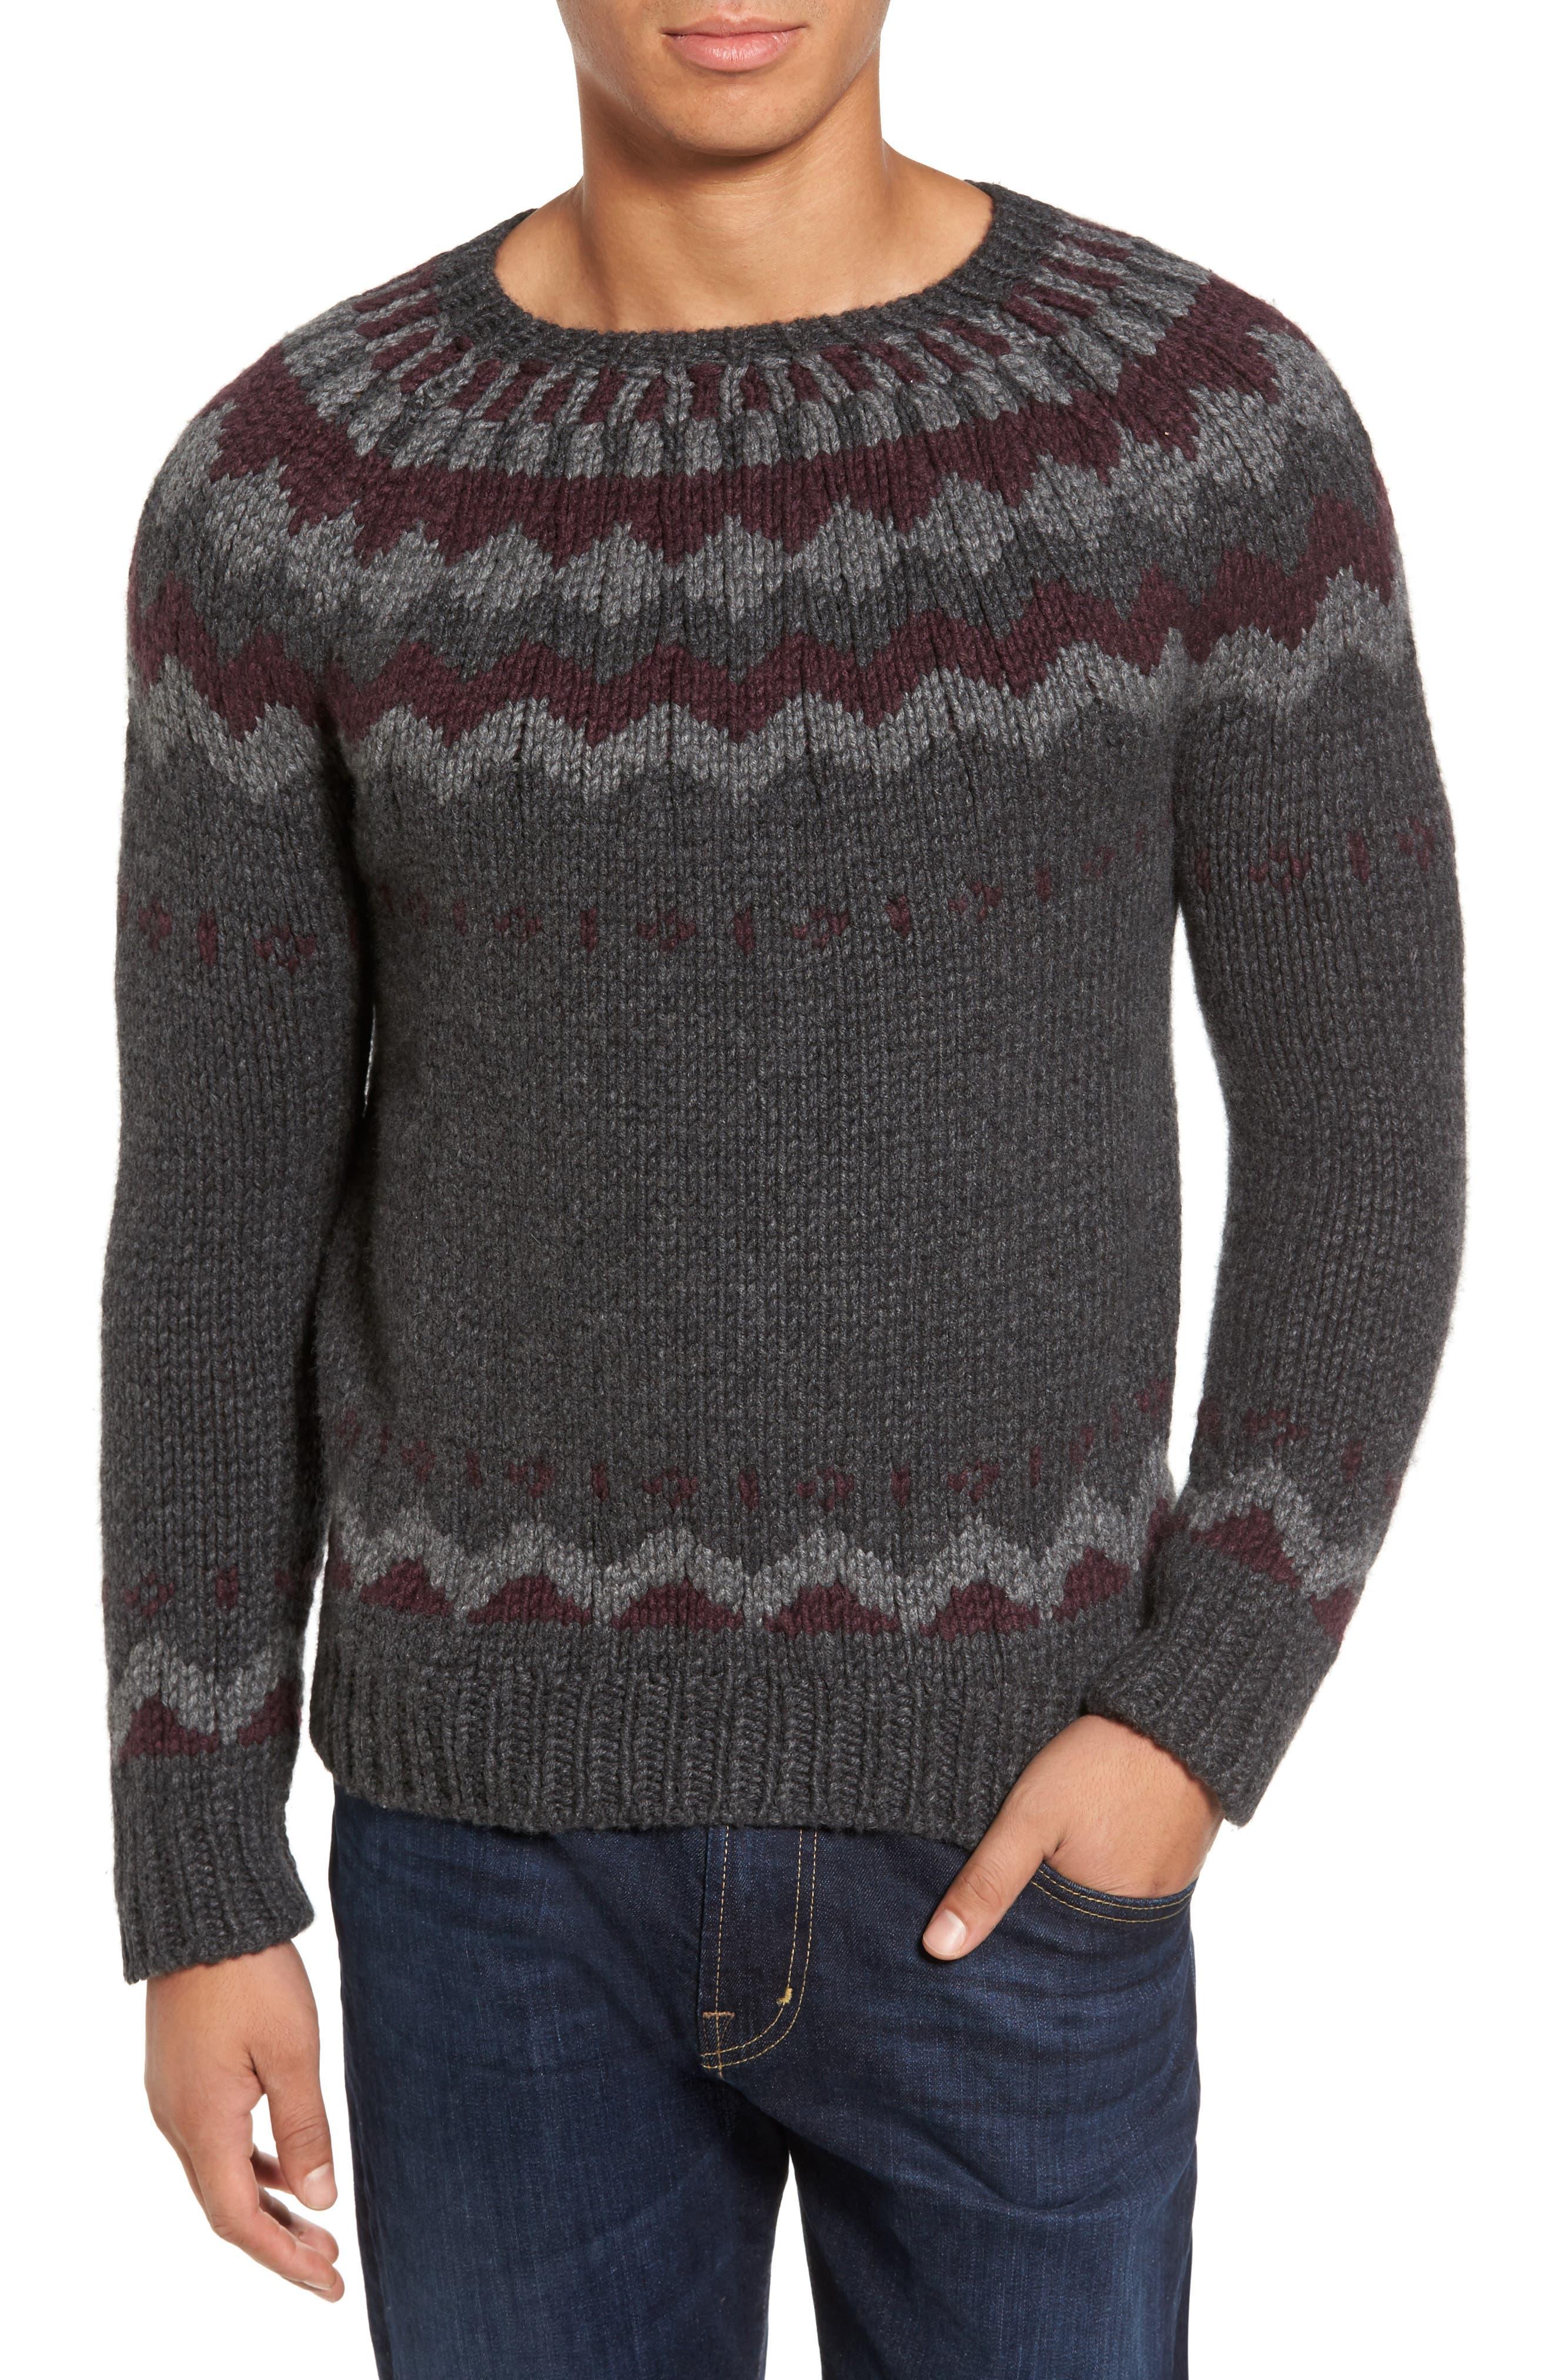 Alternate Image 1 Selected - Eleventy Intarsia Cashmere Sweater